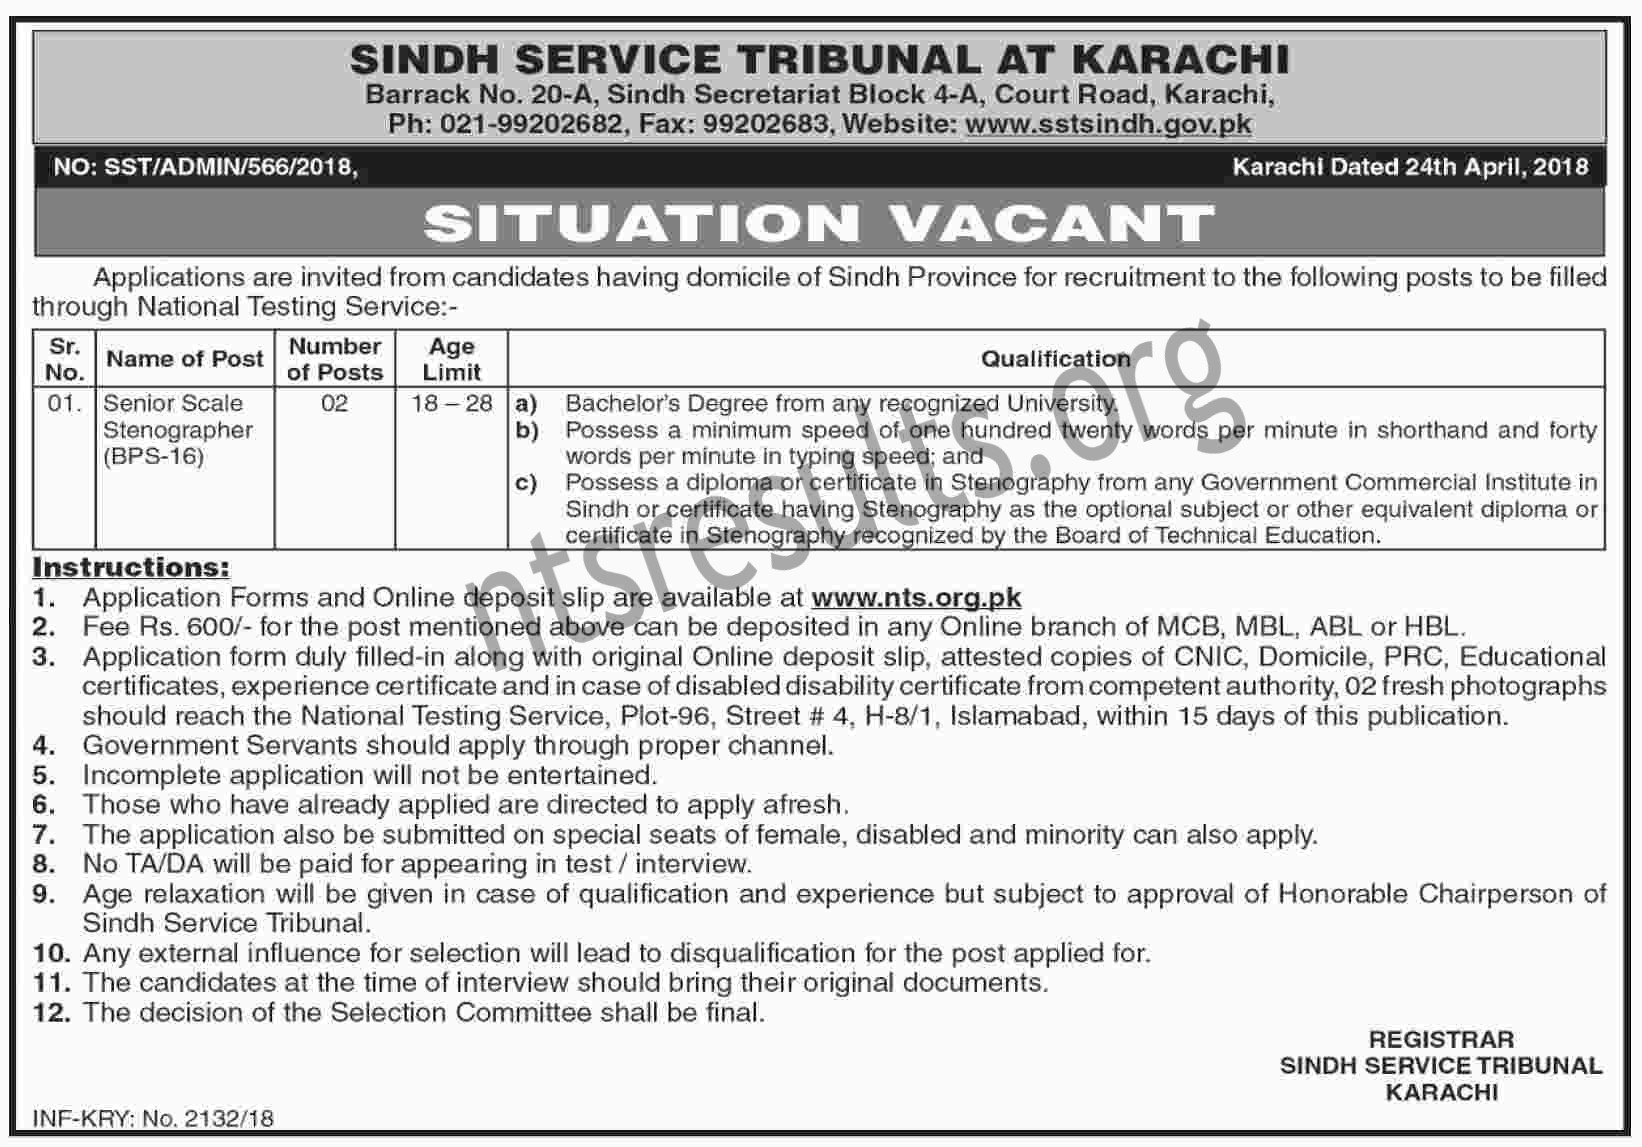 Sindh Service Tribunal Karachi Jobs Via NTS